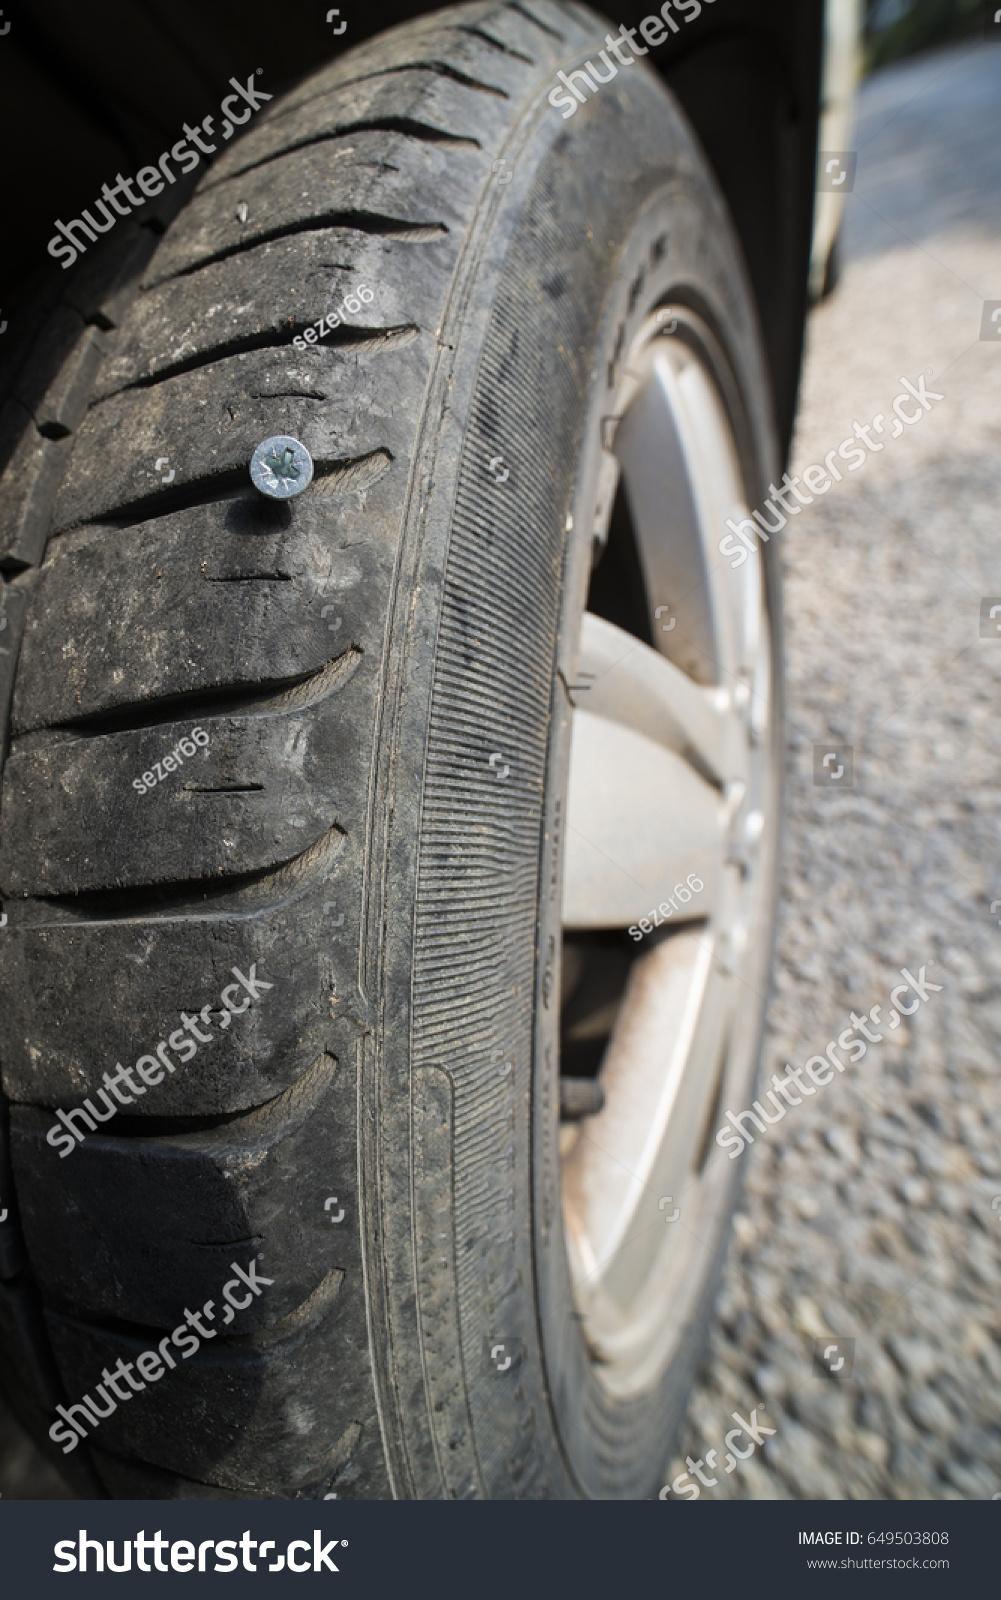 Tire Tread Nail Stock Photo (Royalty Free) 649503808 - Shutterstock